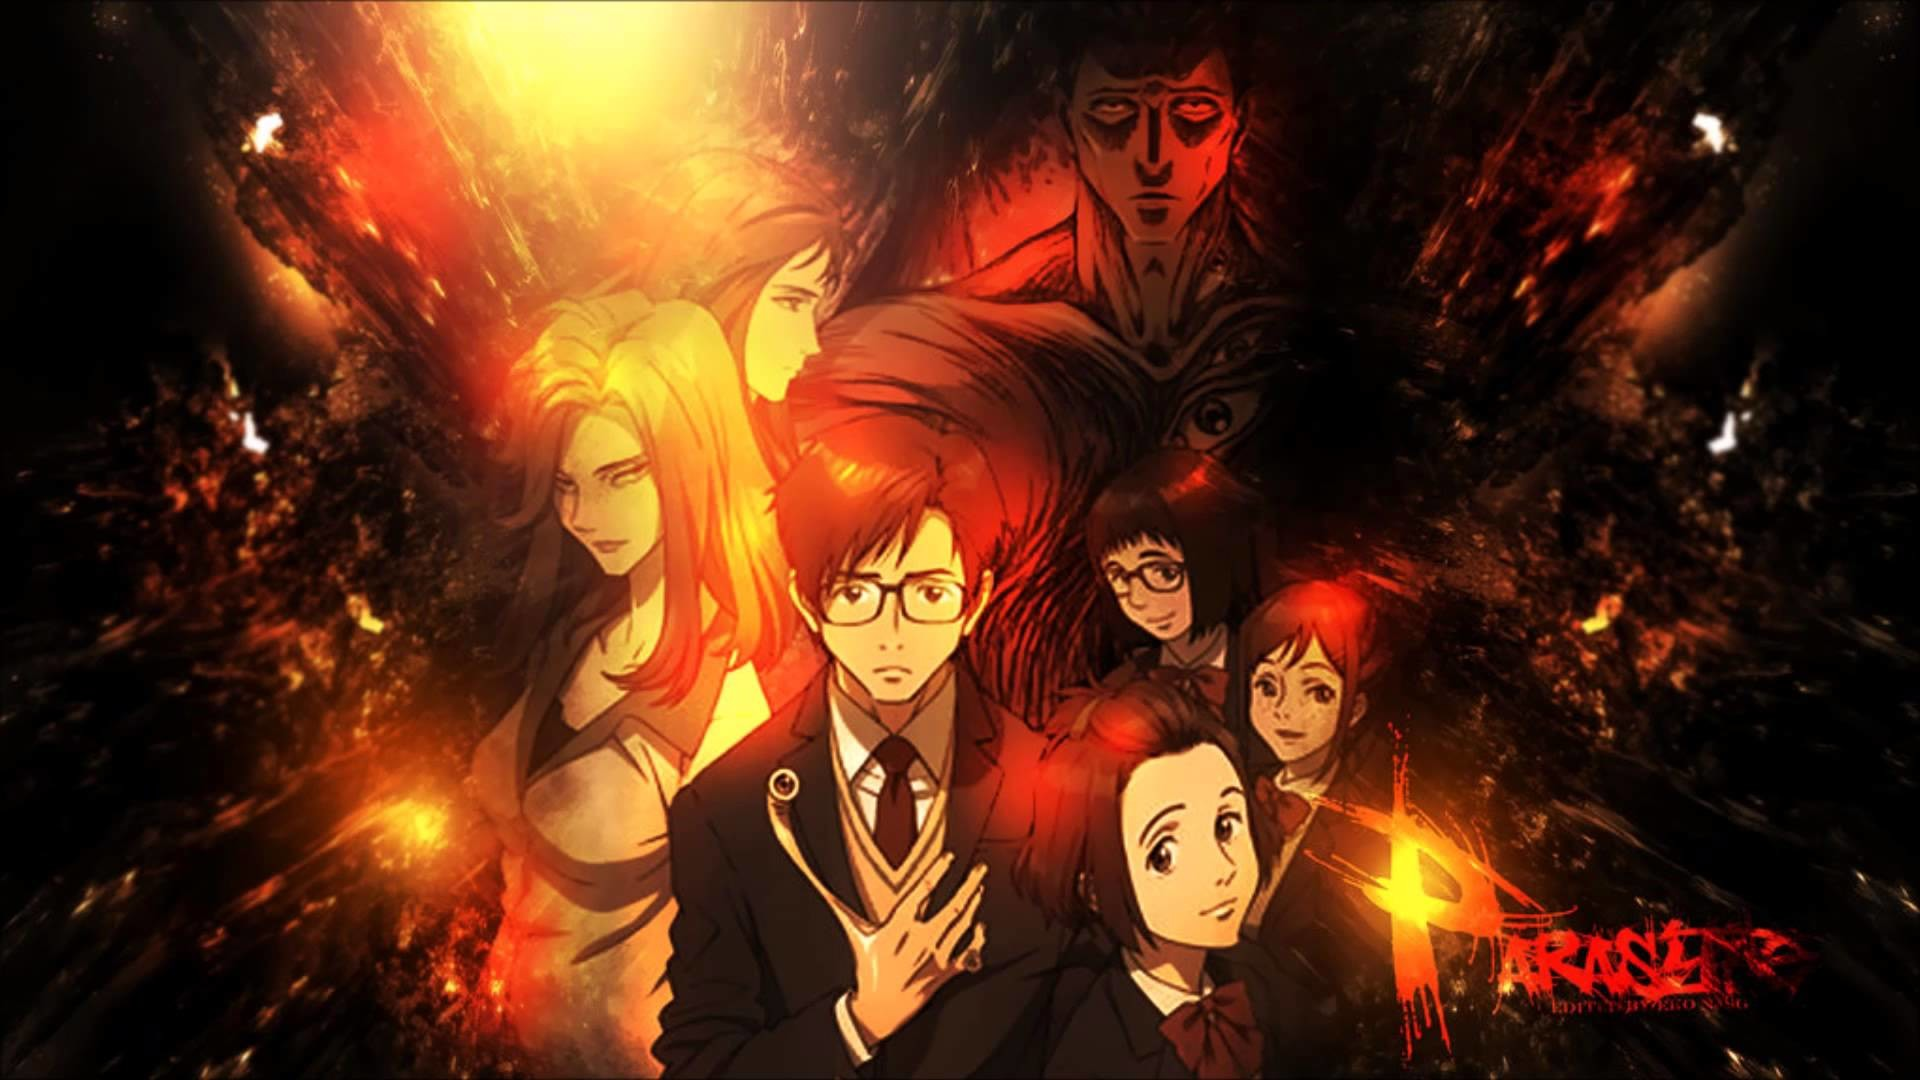 kiseijuu sei no kakuritsu (parasyte) ost : the truth & kill the puppets –  YouTube